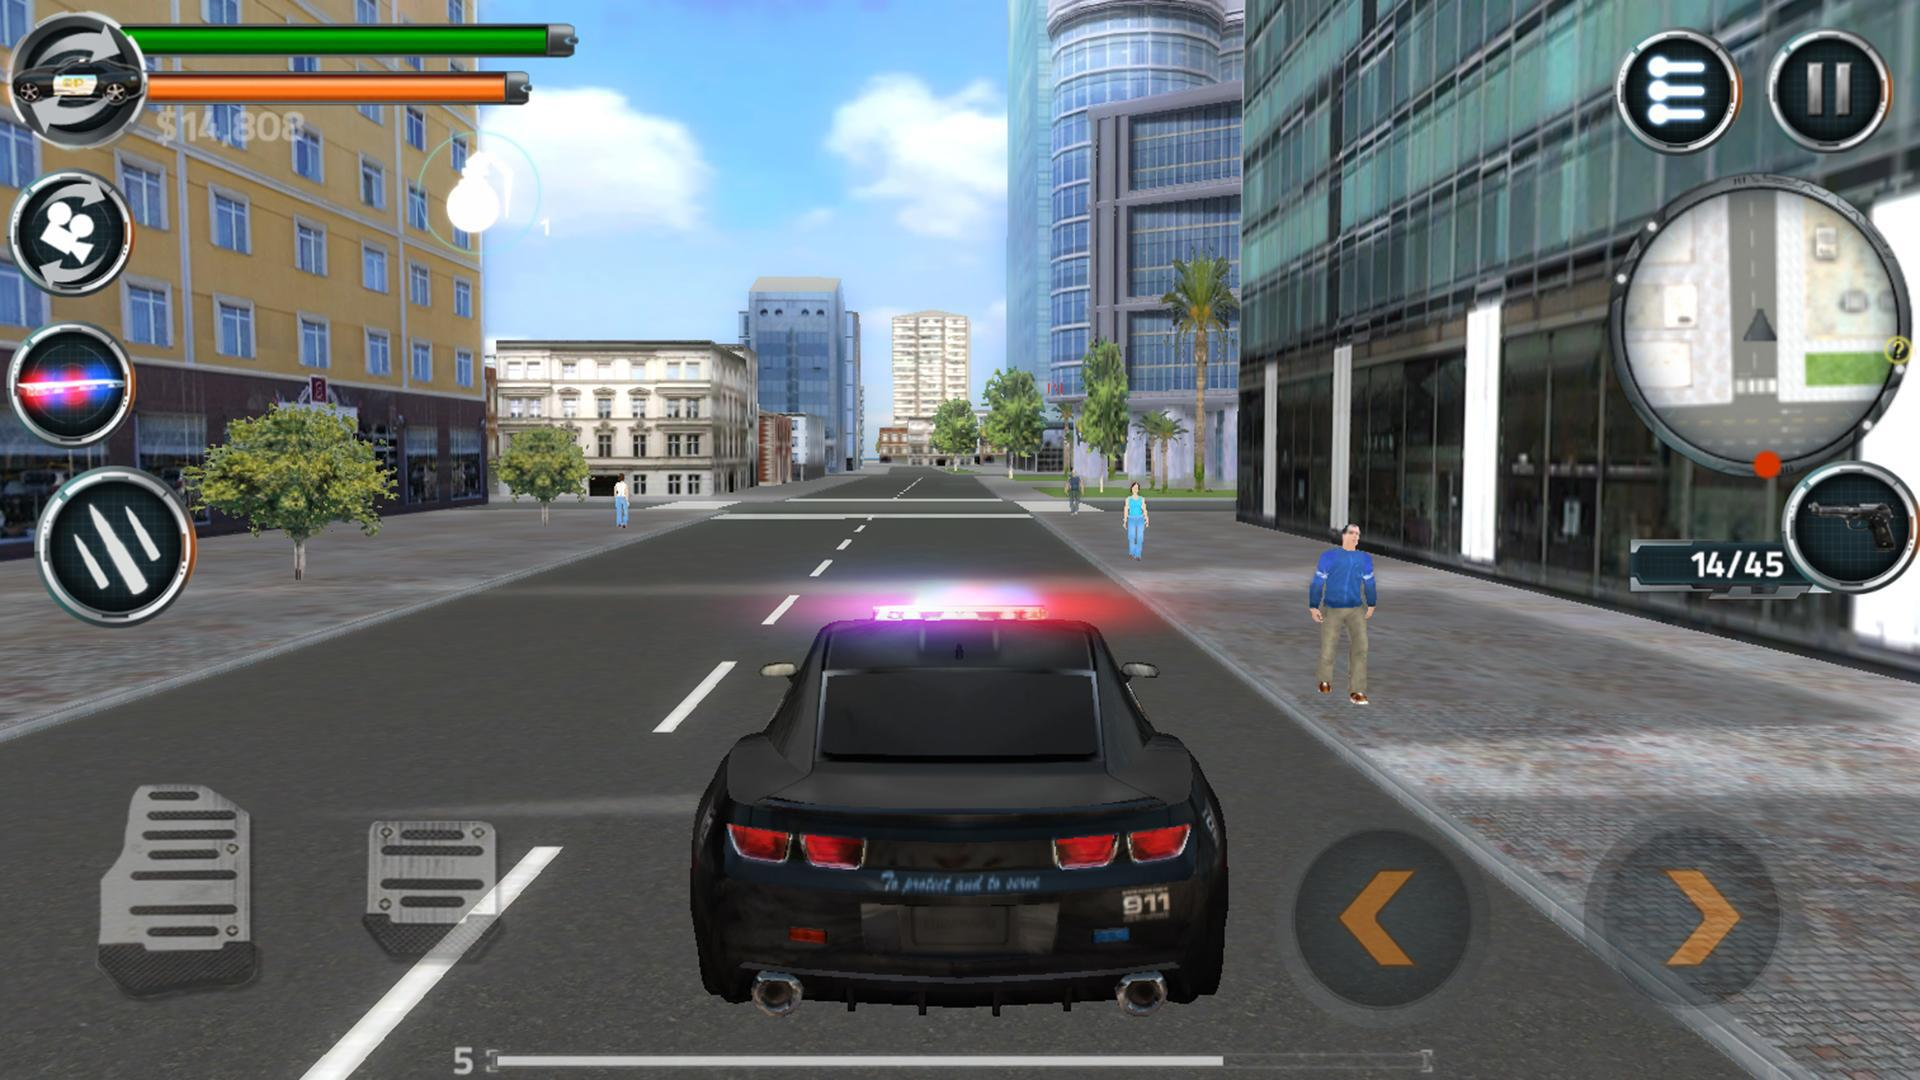 Crimopolis - Cop Simulator 3D 游戏截图2